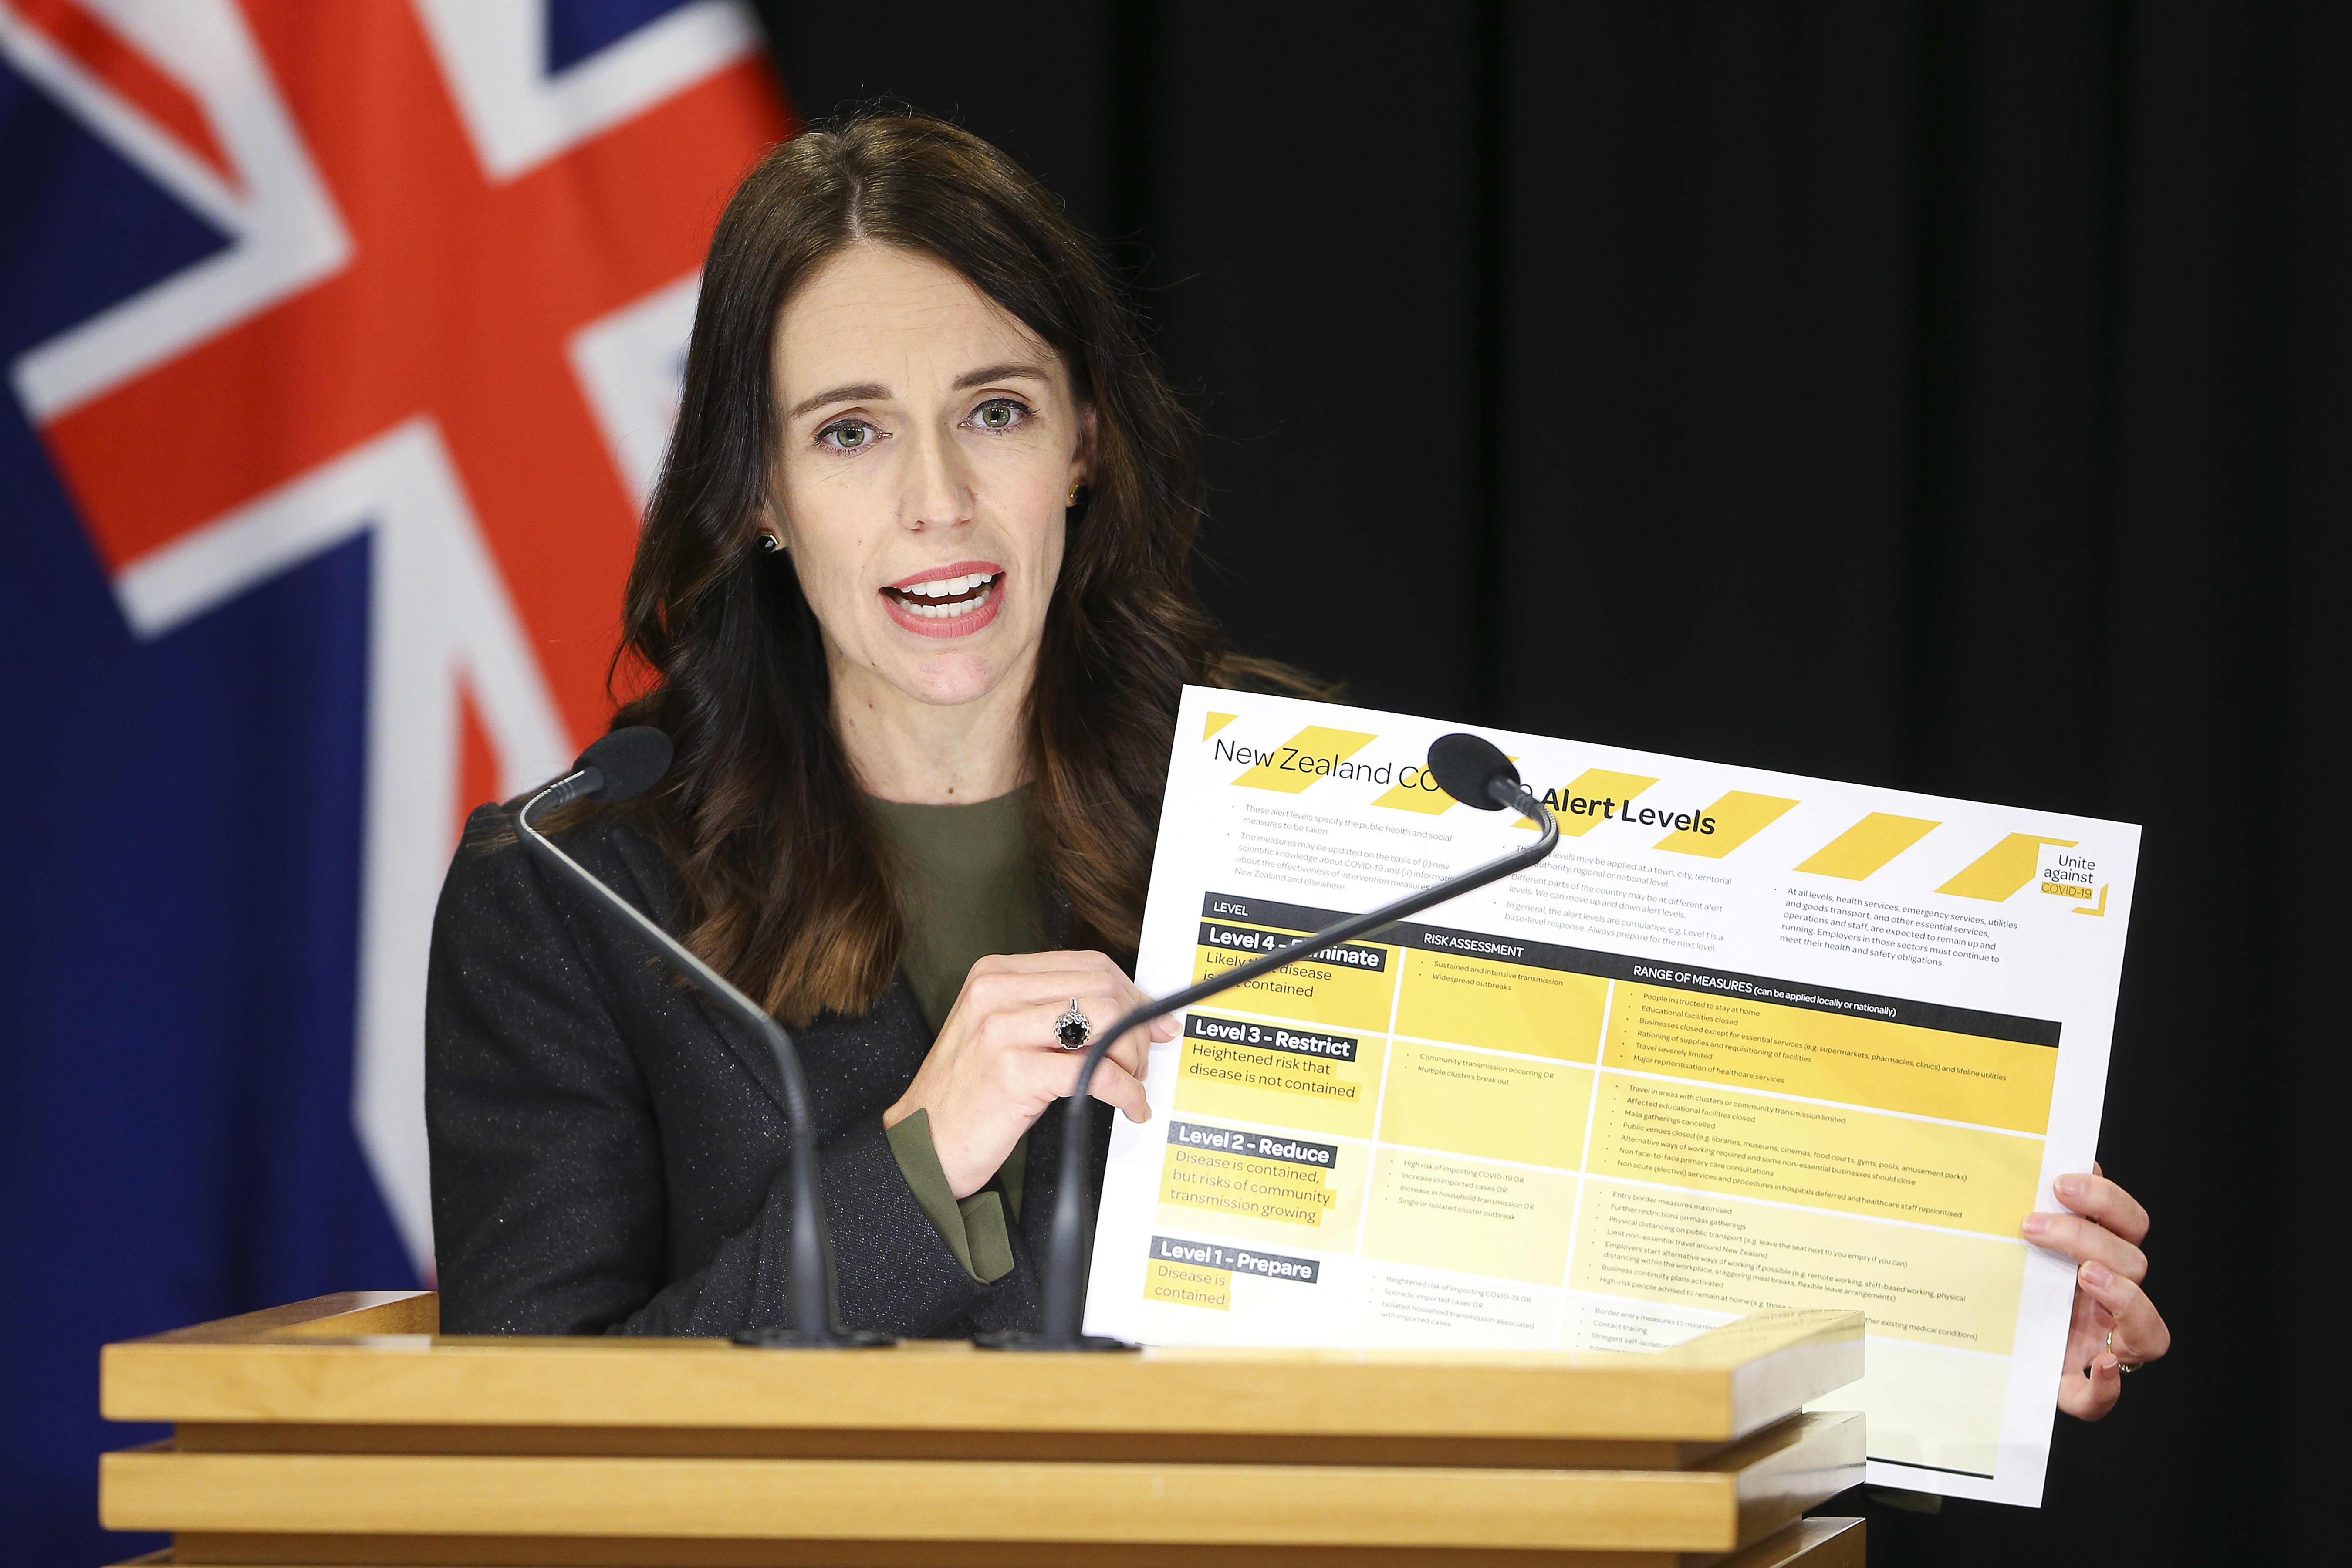 New Zealand leader Jacinda Ardern takes 20% pay cut due to the coronavirus